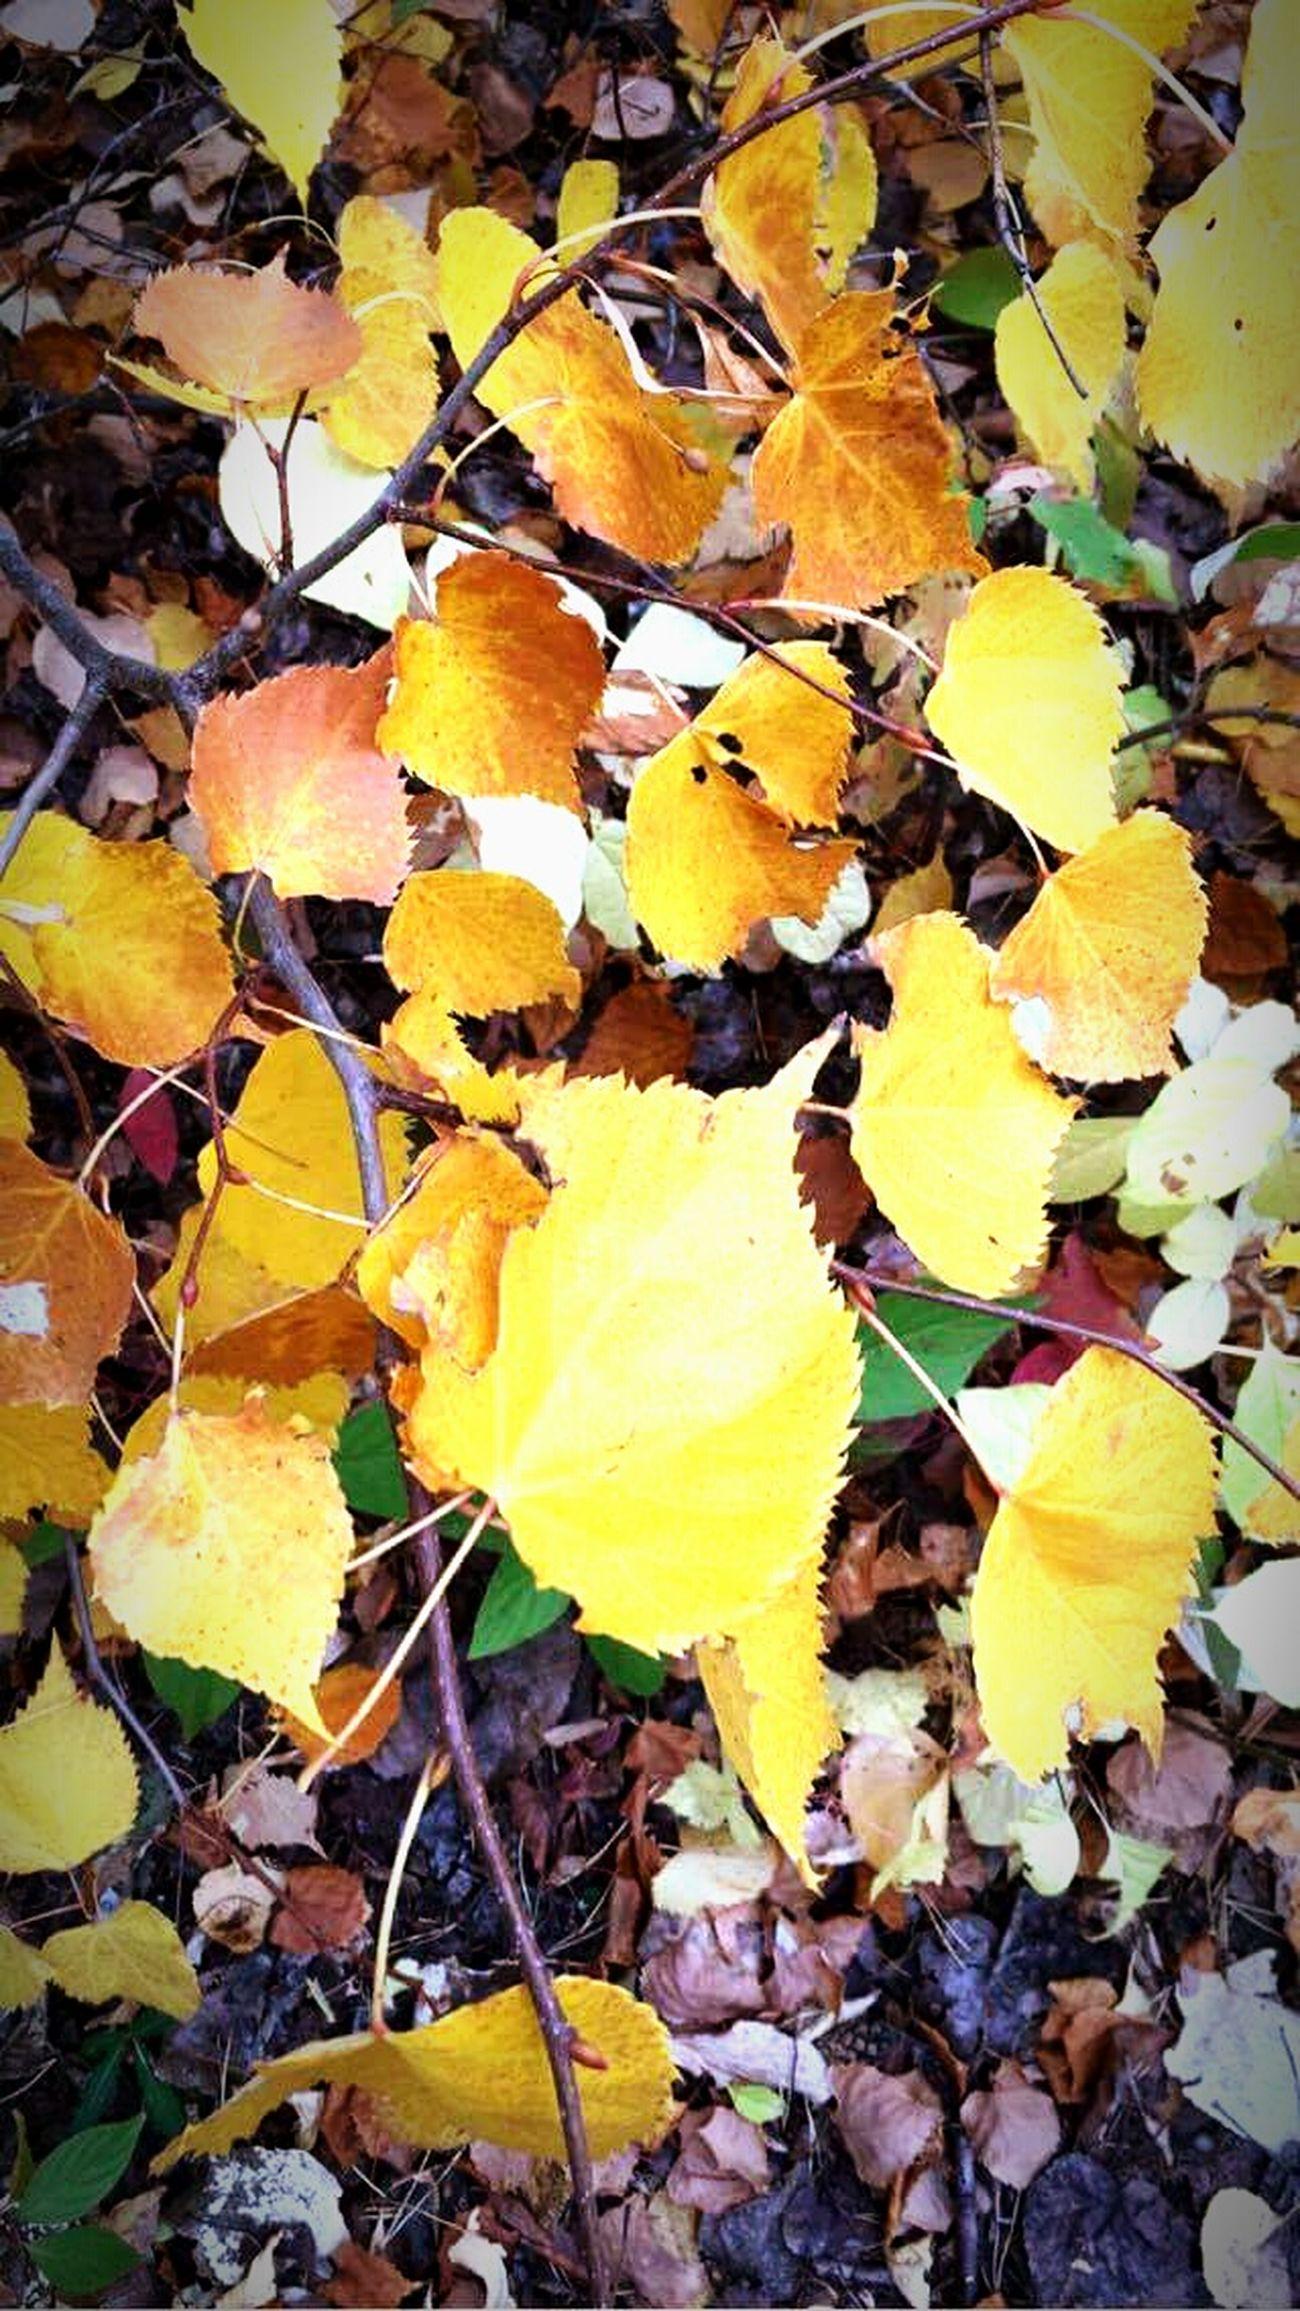 Love is fall. Autumn🍁🍁🍁 Fall Beauty Fall Leaves Autumn Leafs Falling Leaves Yellowfall Autumnbeauty Autumn 2016